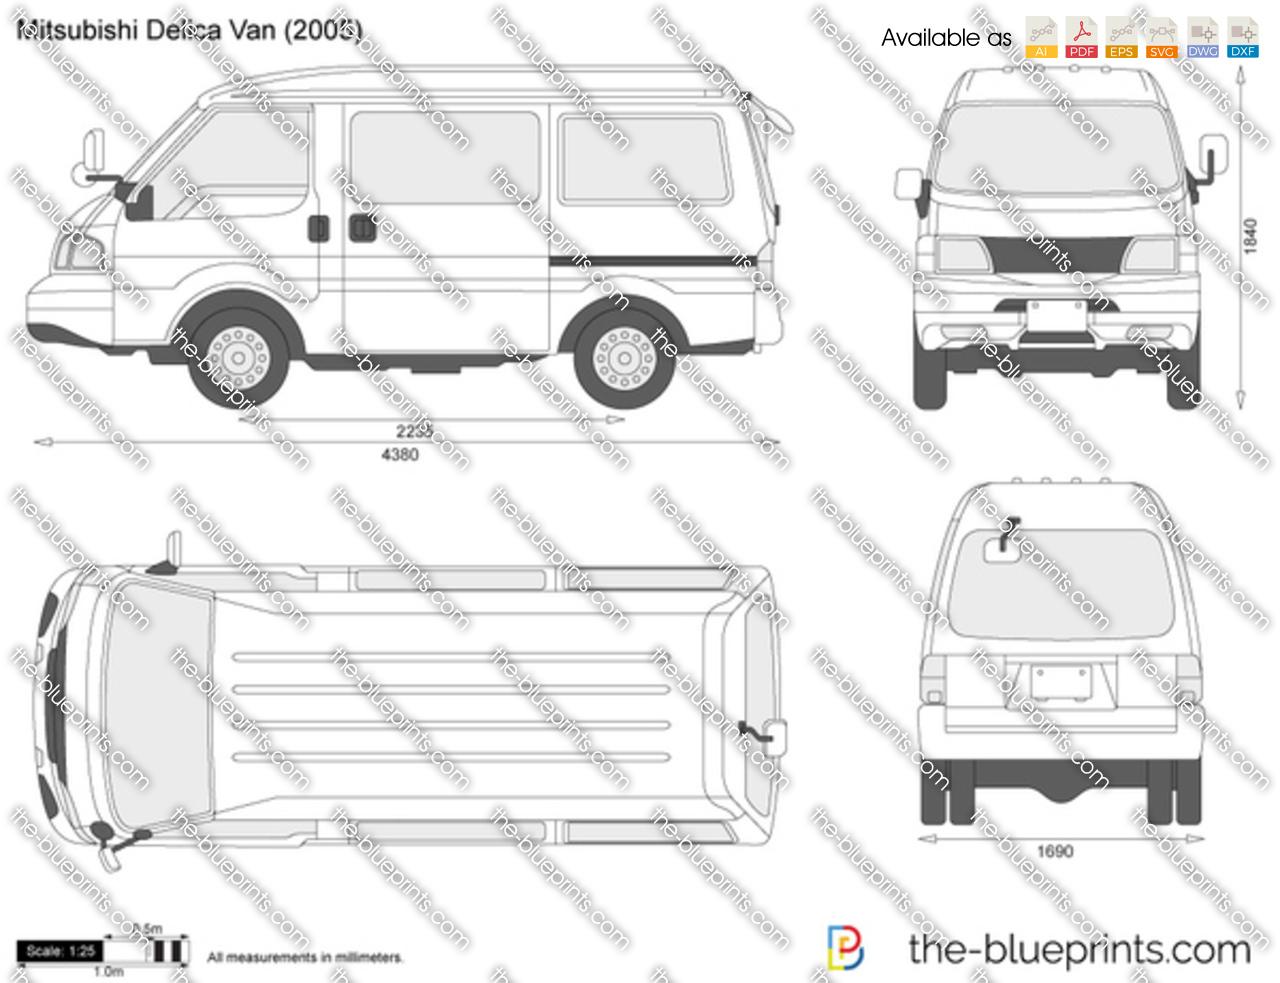 Mitsubishi Delica Van 1992